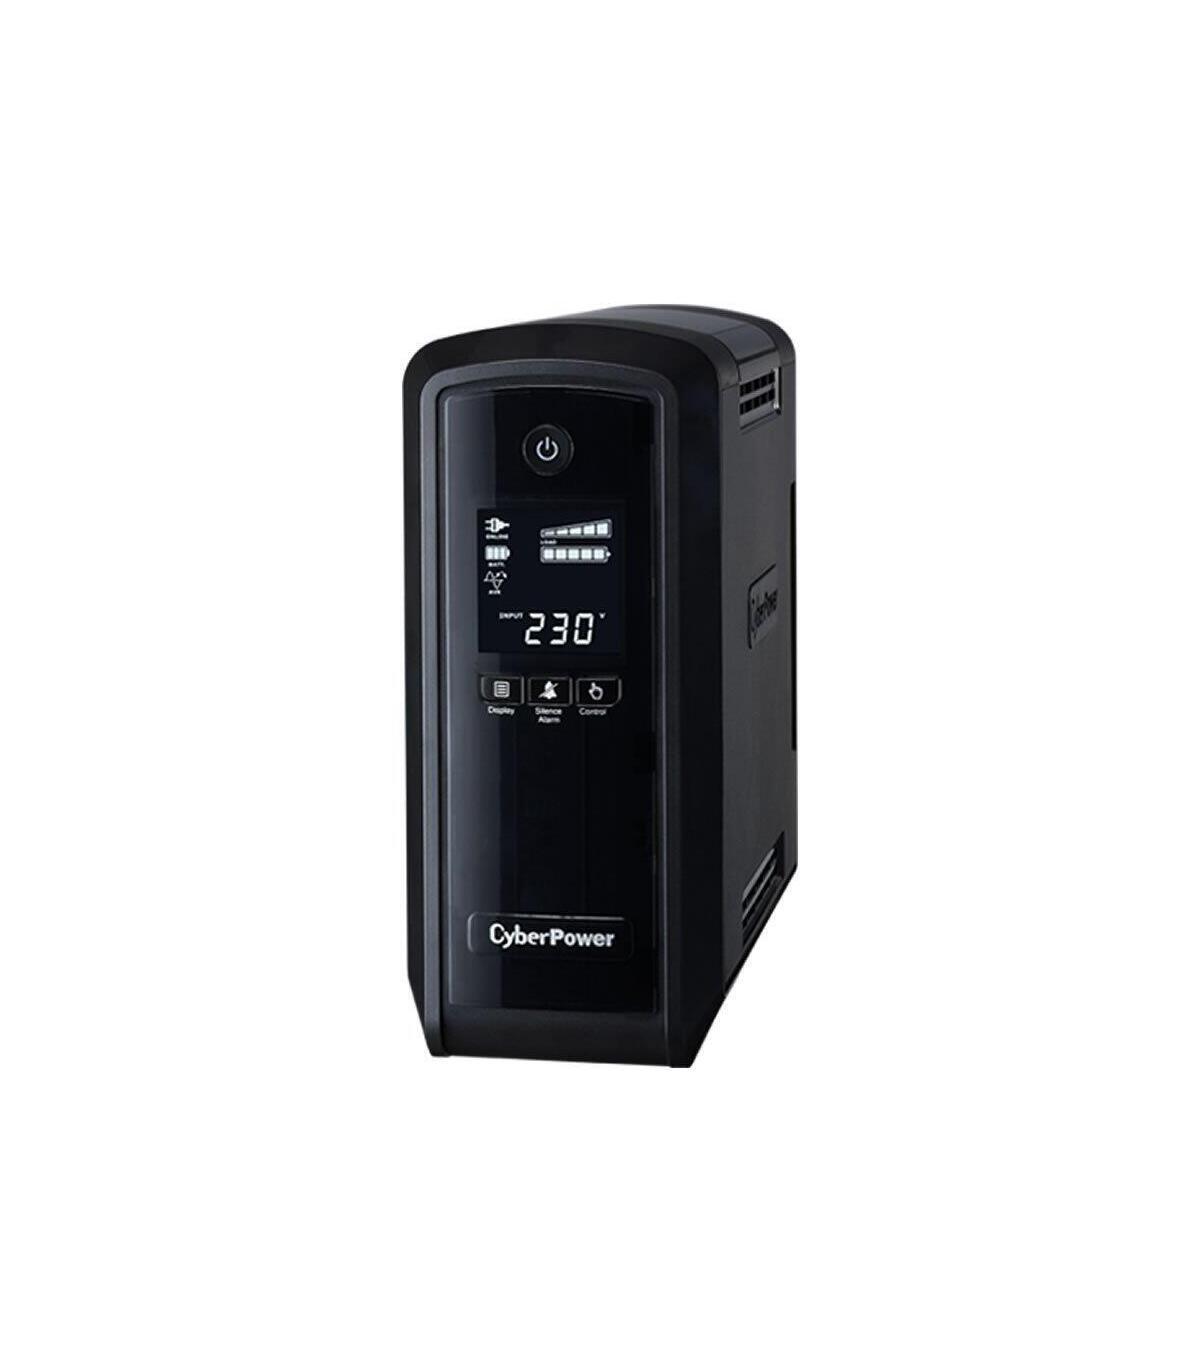 Huawei 53036238/A1/Secure Home Wi-Fi de Malla de Sistema de Router 3/Unidades Extensor Long Range de Wi-Fi de Repuesto Protecci/ón de Seguridad con Protecci/ón Juvenil